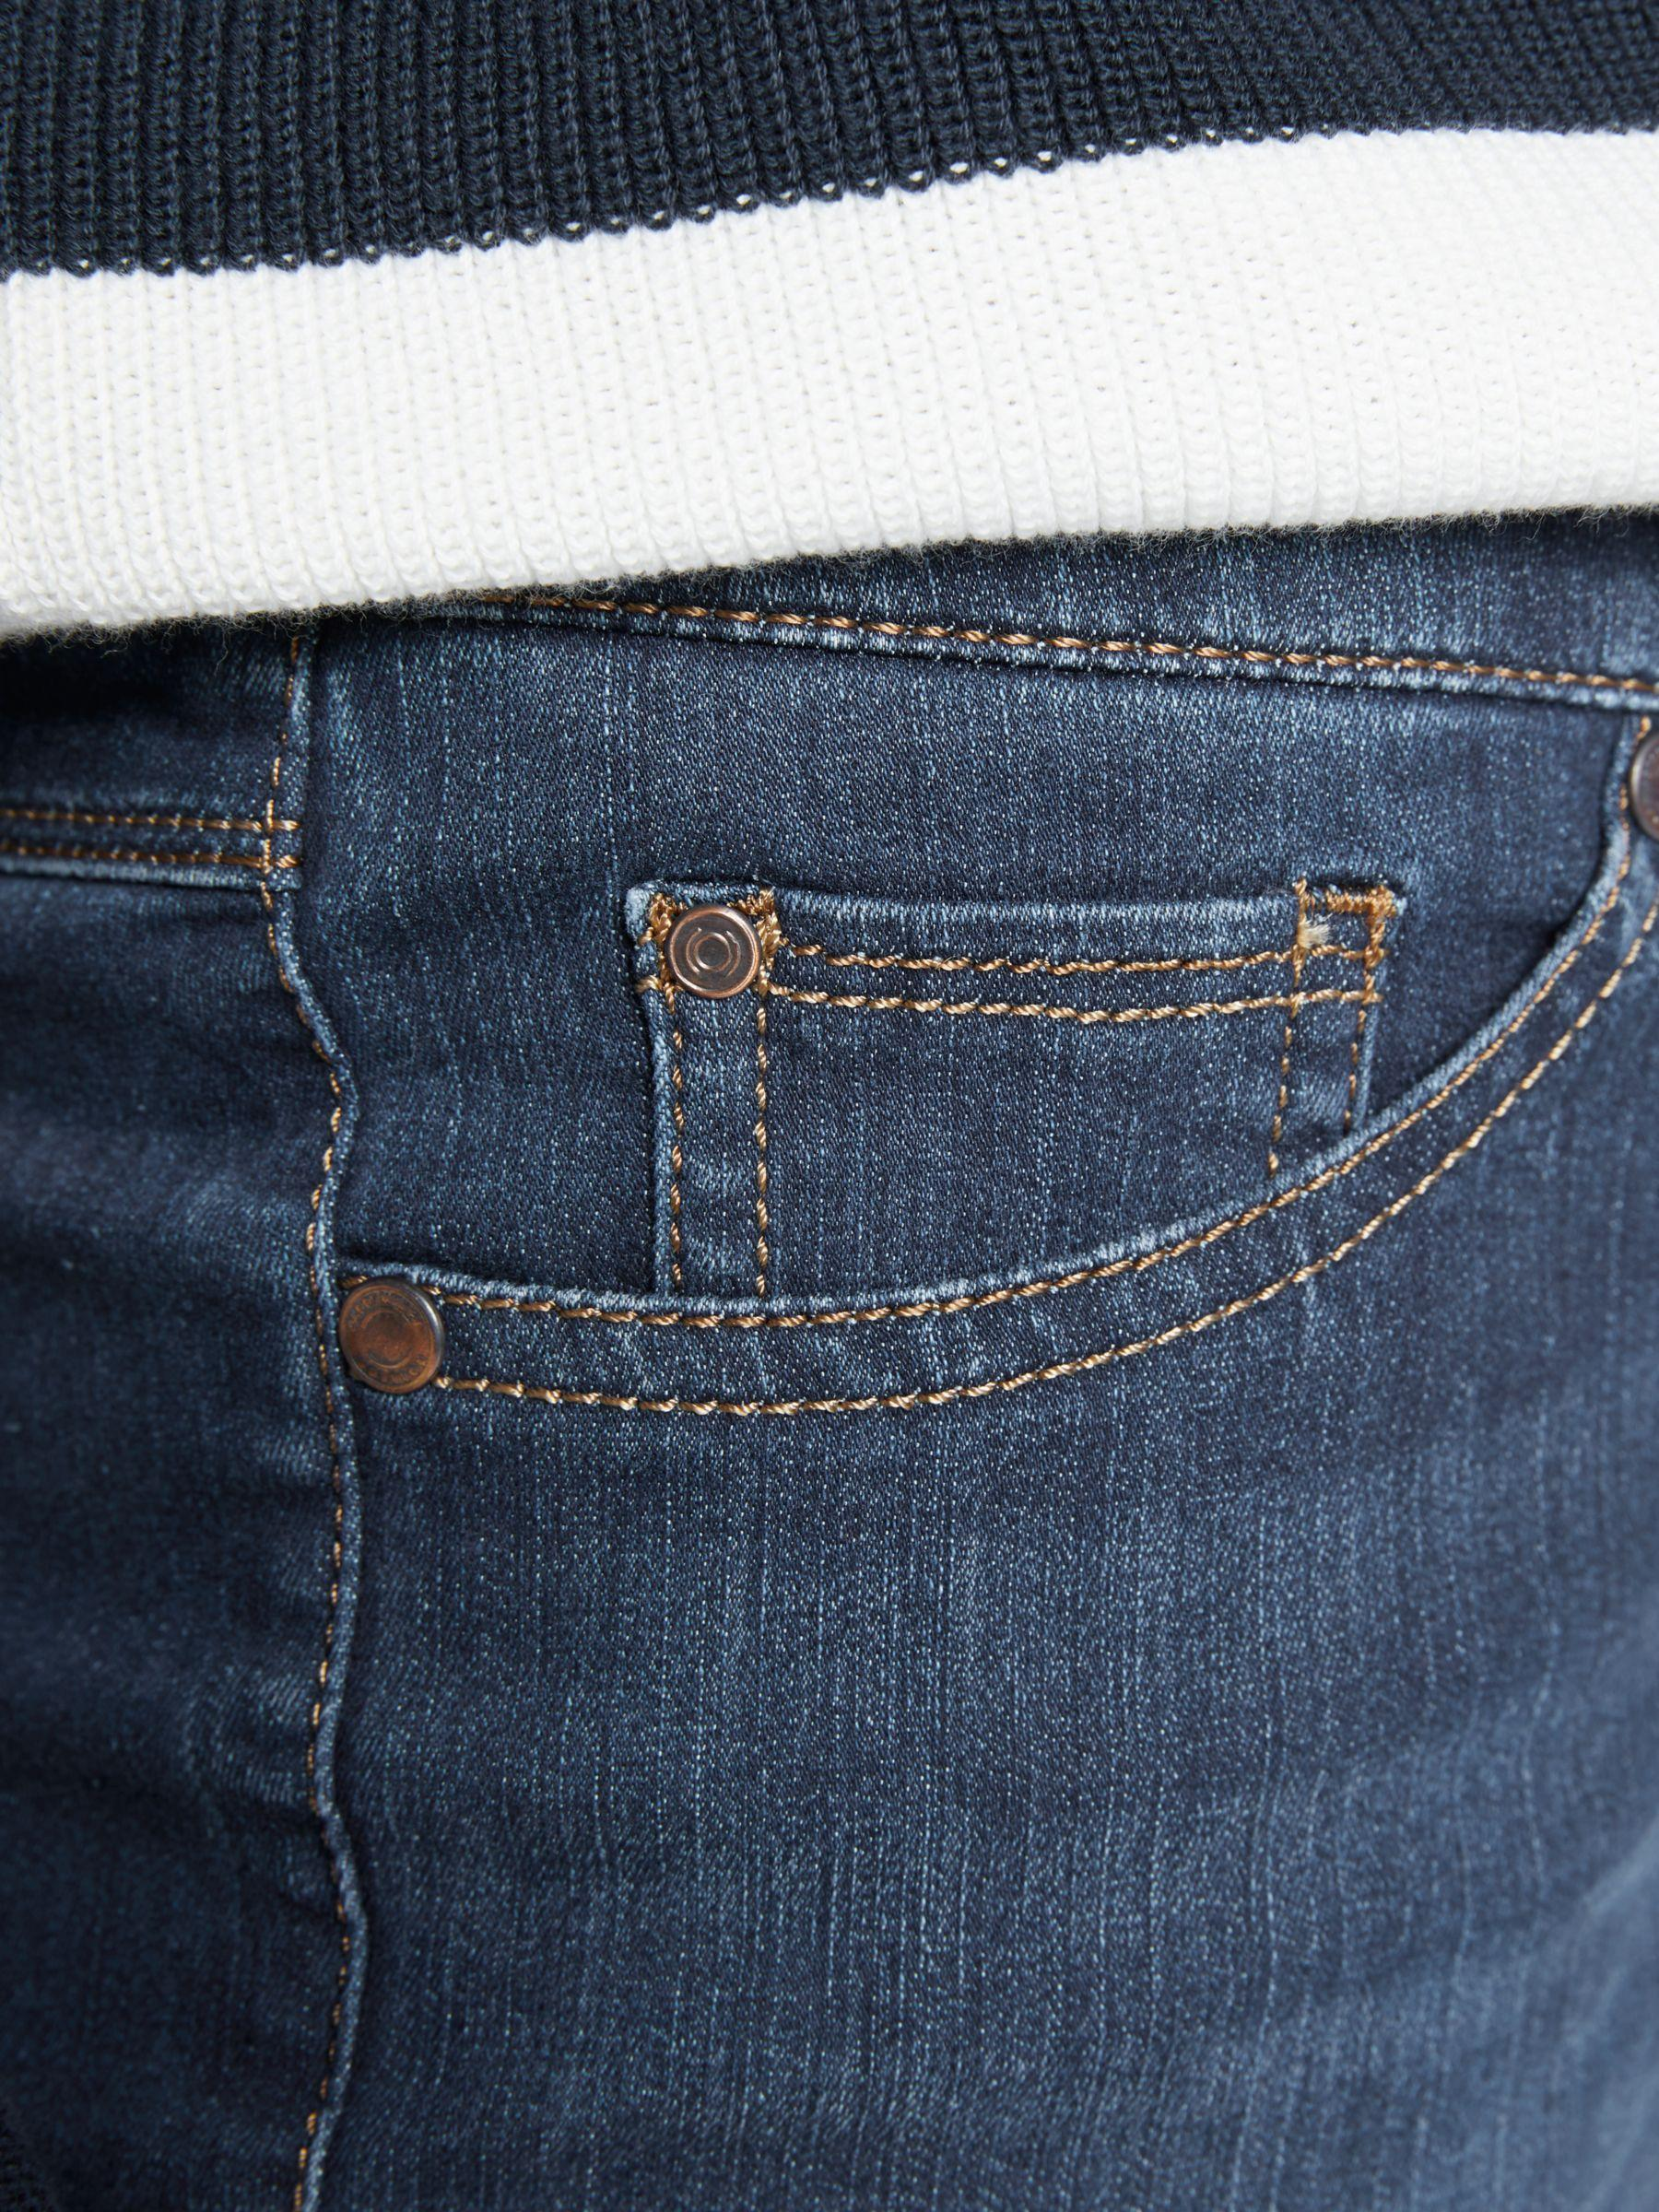 Gerry Weber Denim Best4me Slim Leg Jeans in Blue